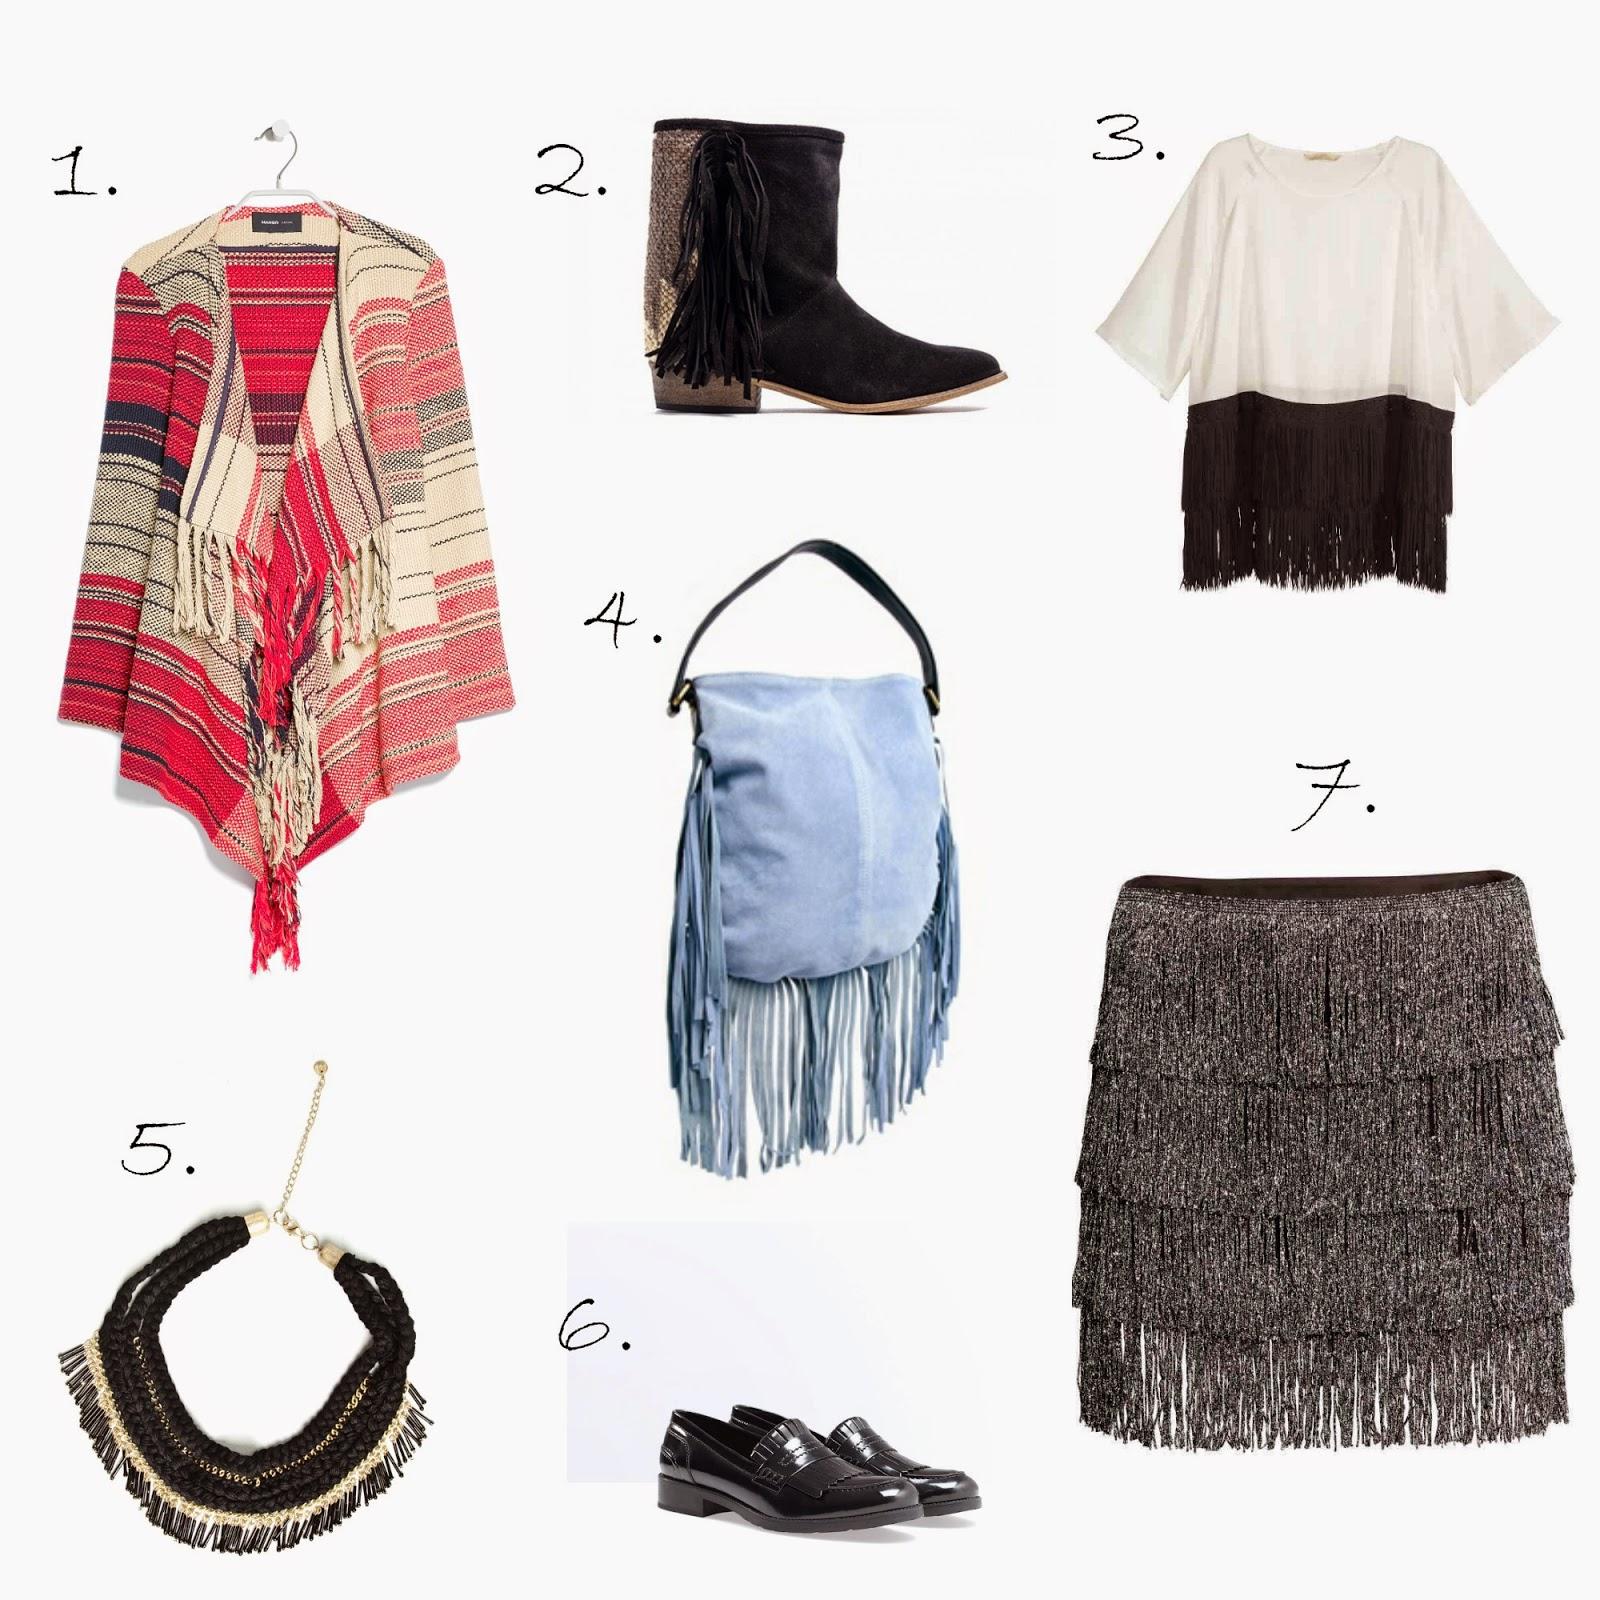 poncho capa botas bolso falda collar camiseta mocasines de tendencia flecos para otoño 2014